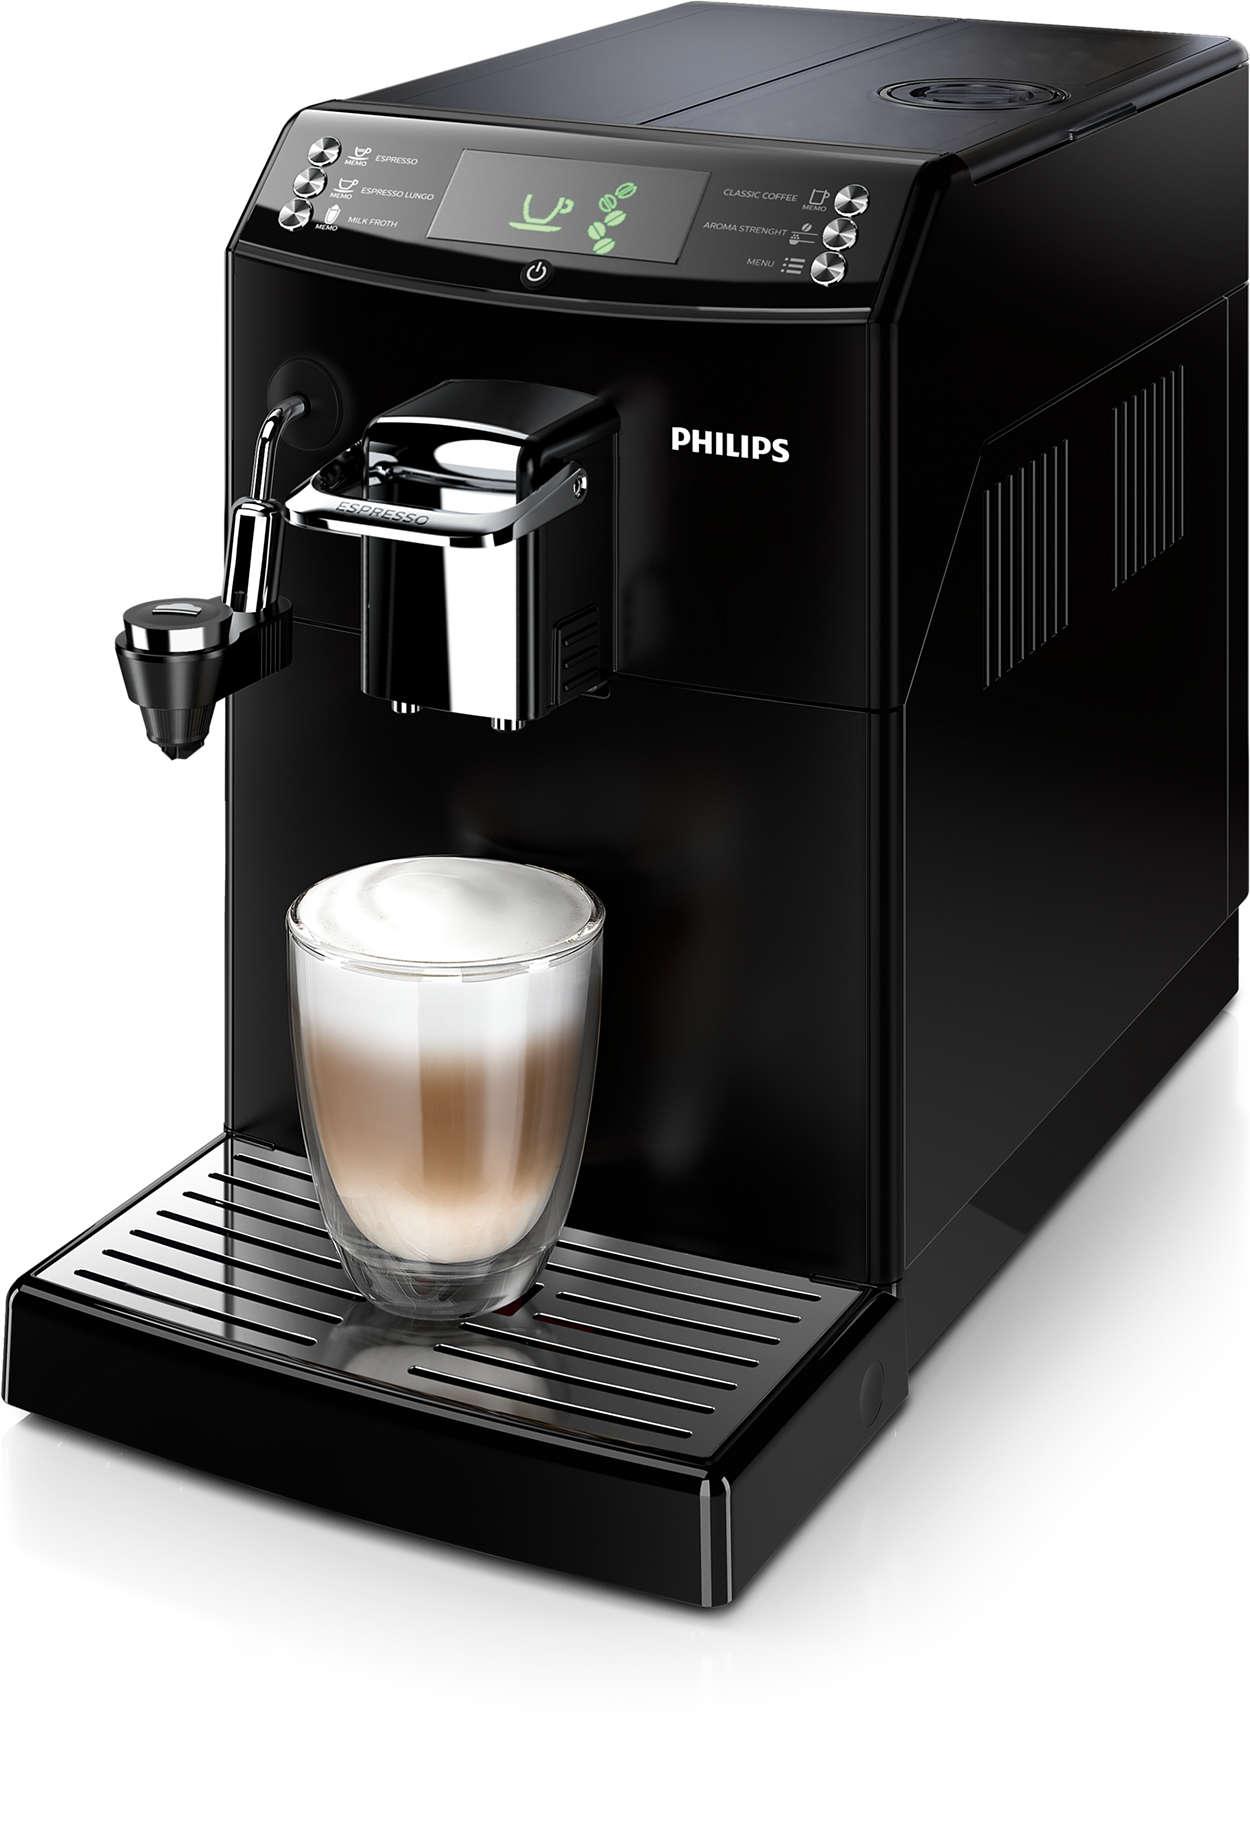 Odličan espresso i pravi okus kave iz filtra